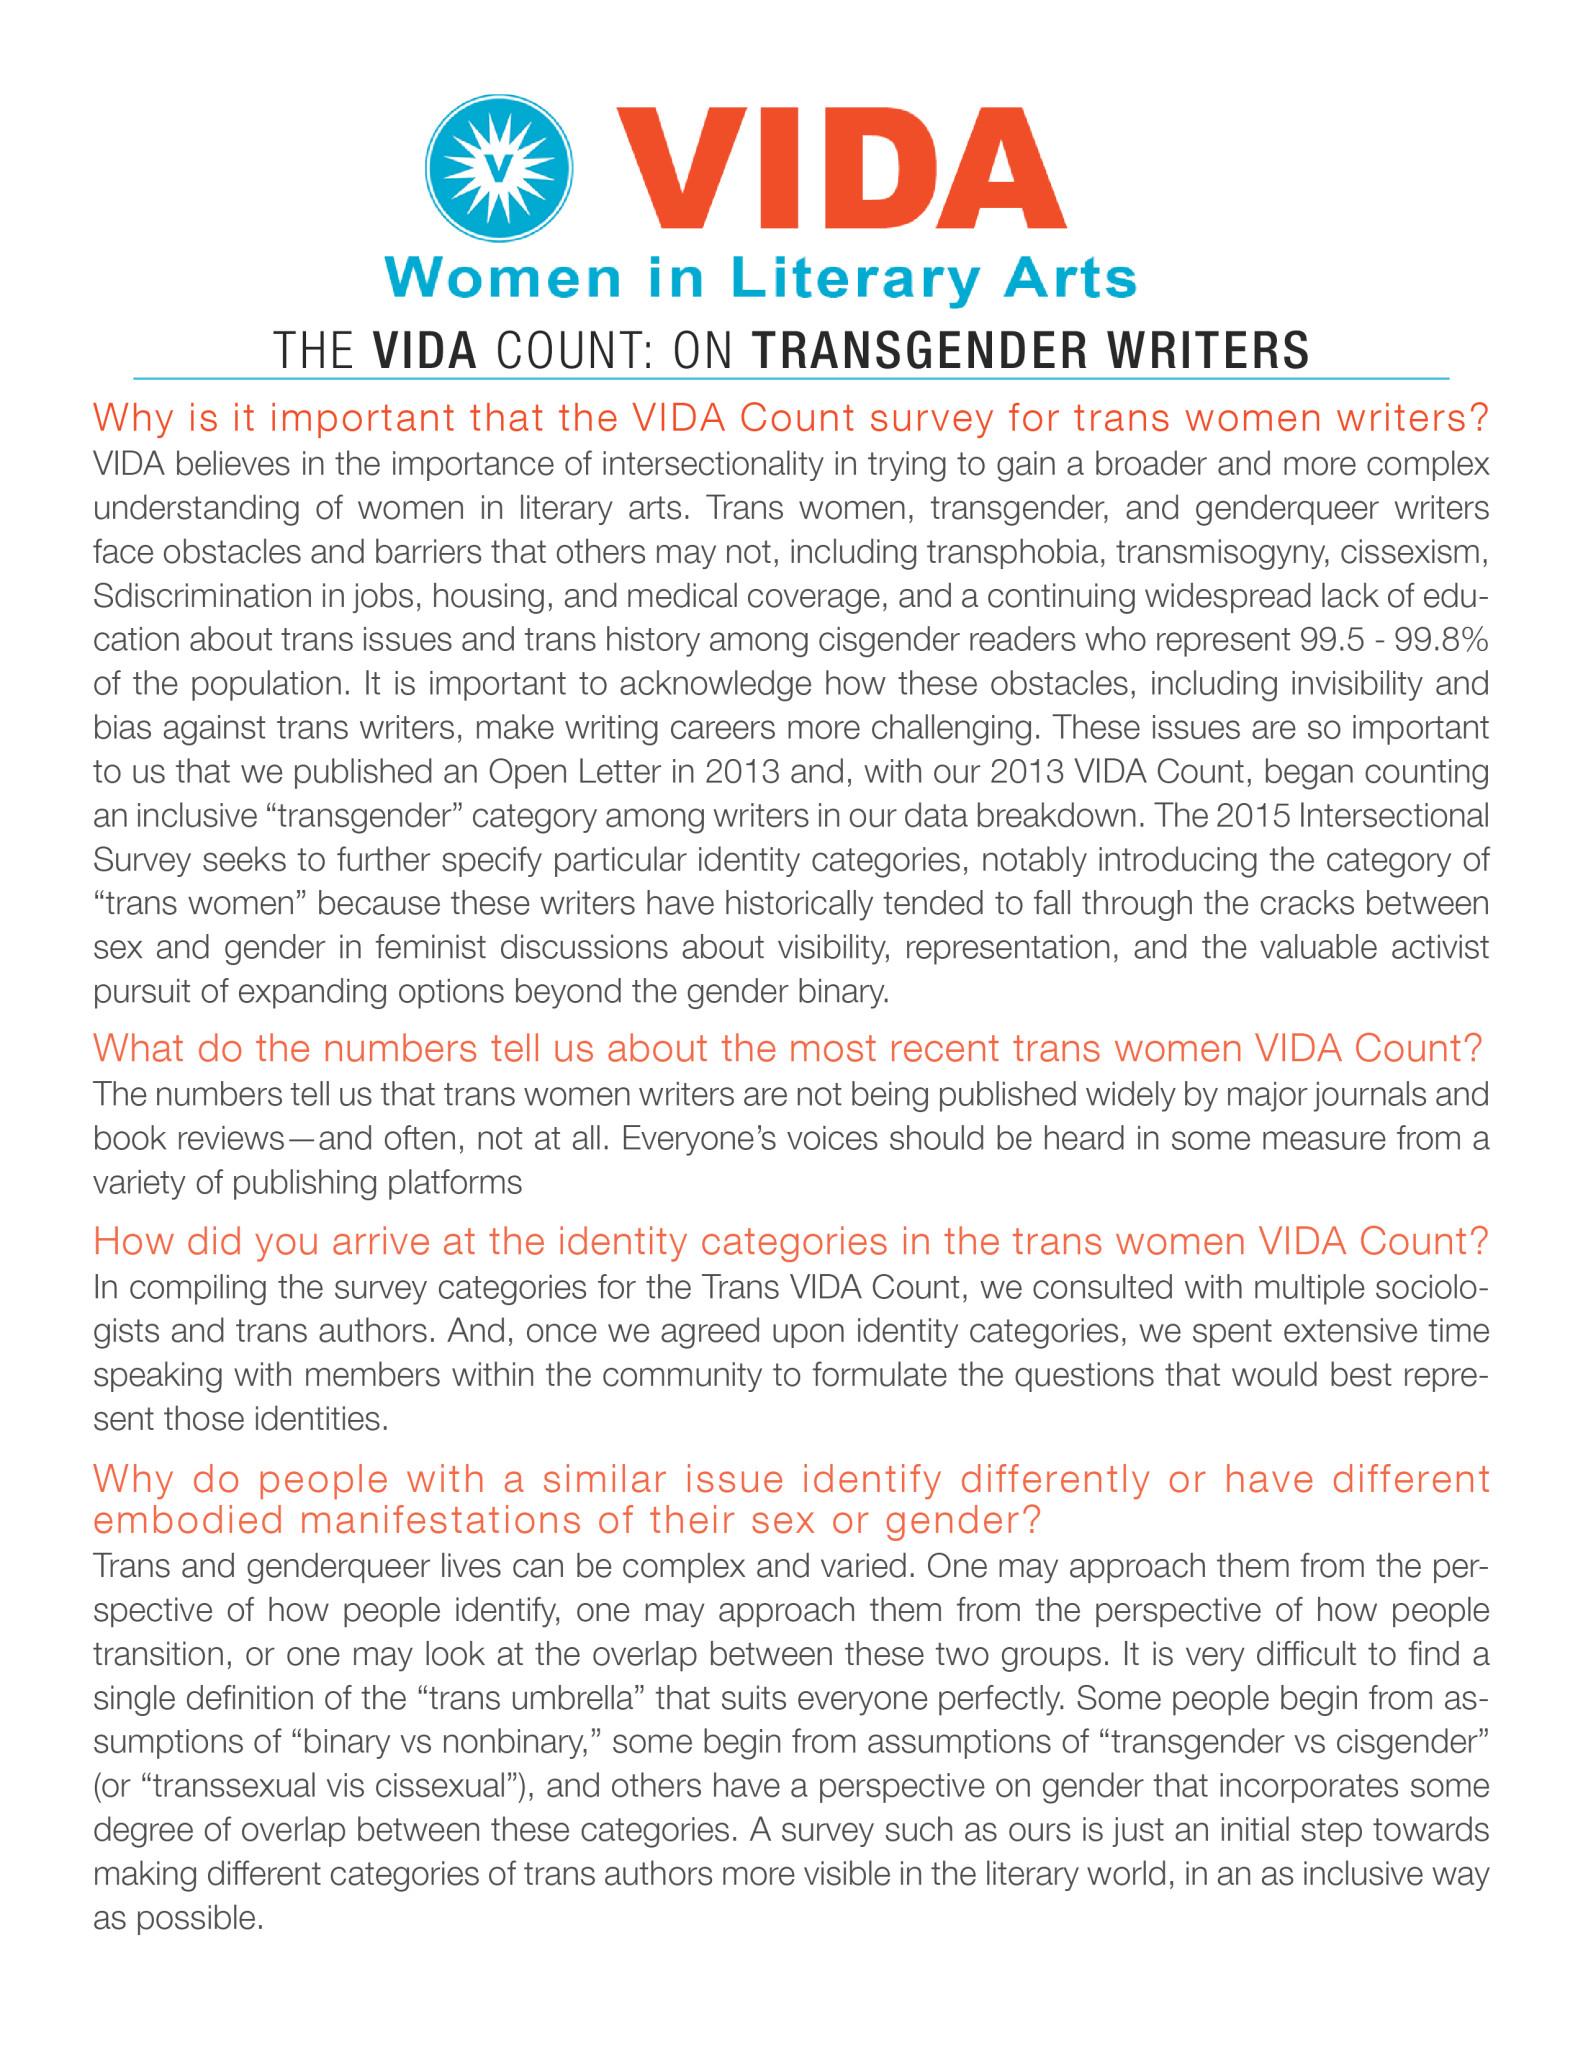 VIDA Trans Primer: page 1